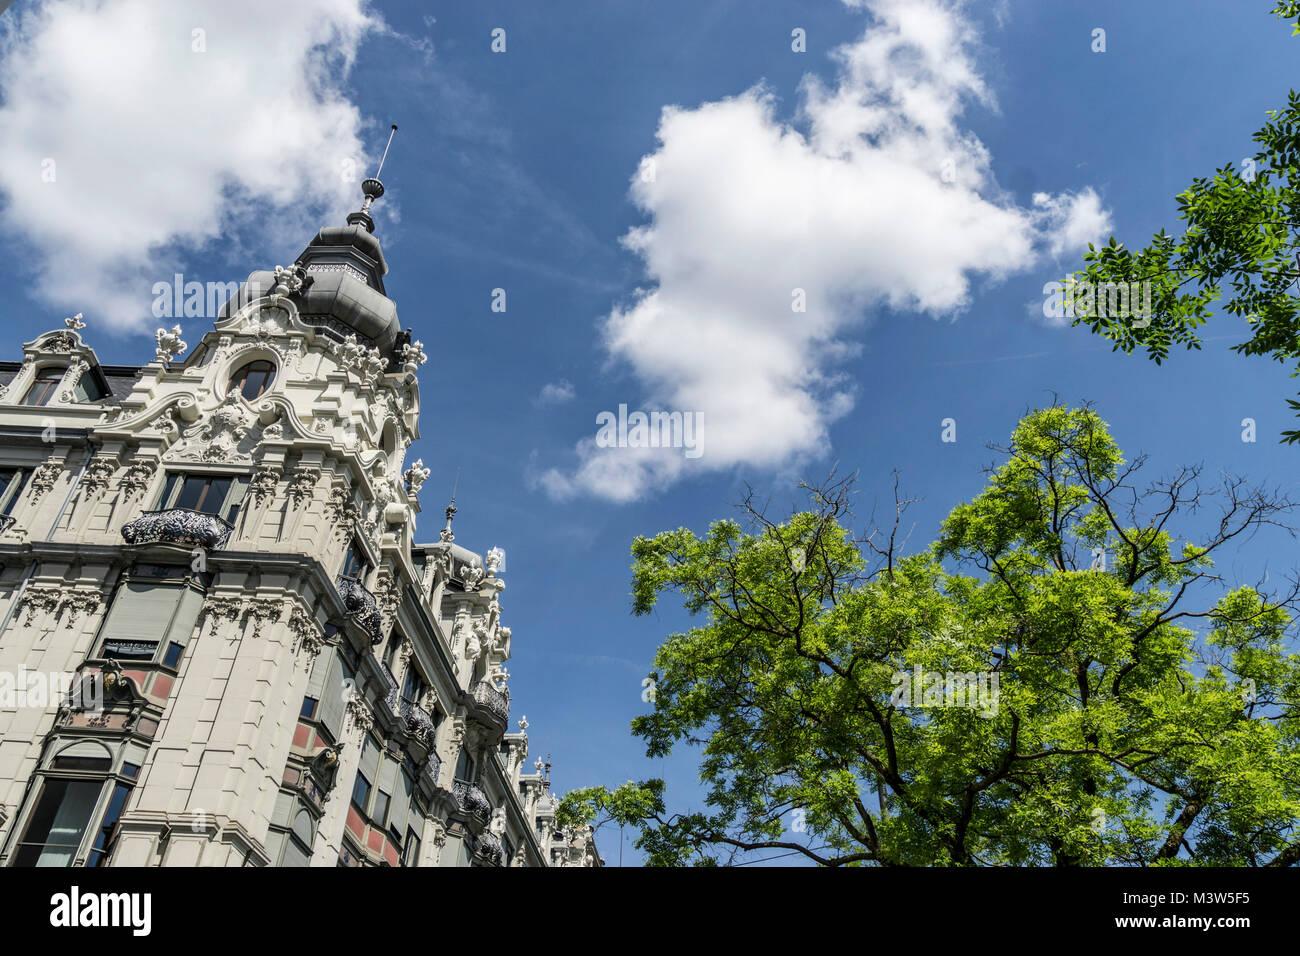 Monopol, Neo-Barock-Illustr., Zürich, Schweiz | Monopol Gebäude, neo-barocke Architektur, Zürich, Stockbild